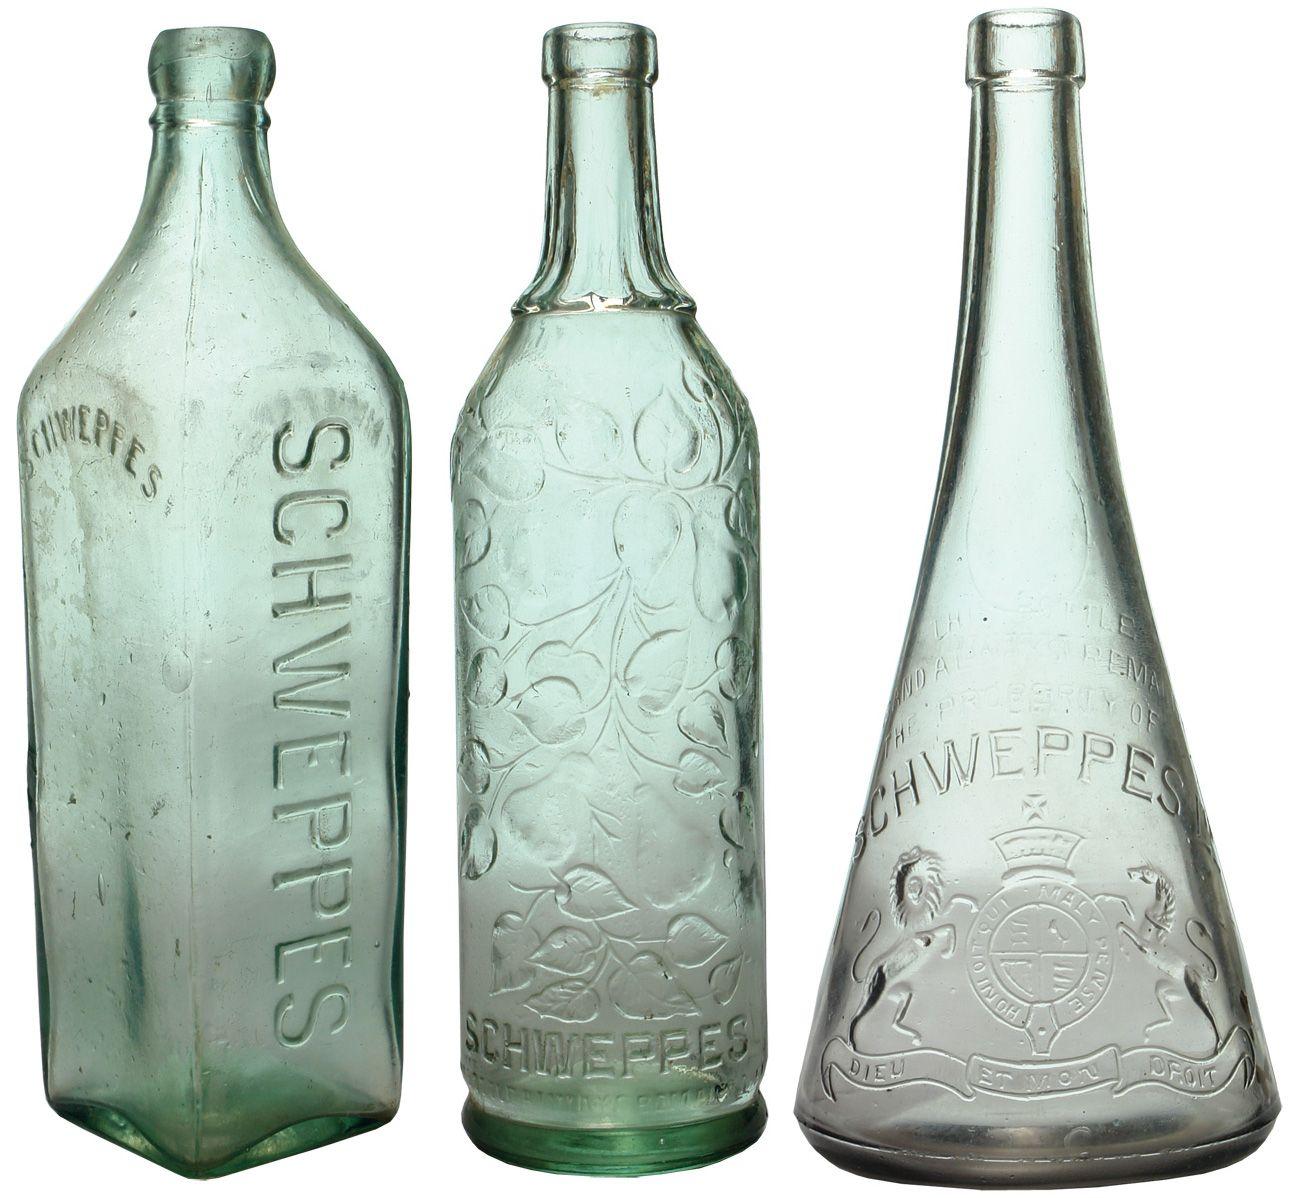 Abcr Antique Bottle Auctions Gallery Bottle Antique Bottle Old Bottles